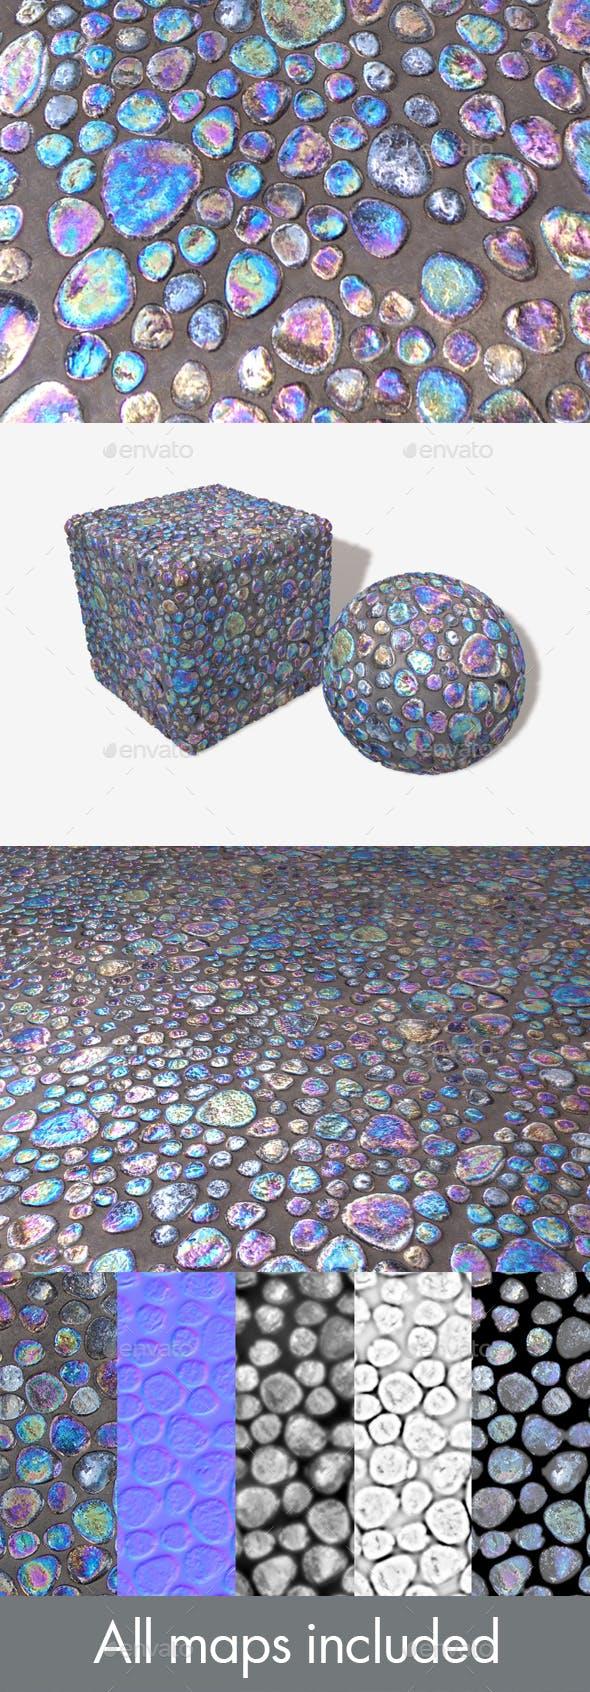 iridescent Pebble Tiles Seamless Texture - 3DOcean Item for Sale